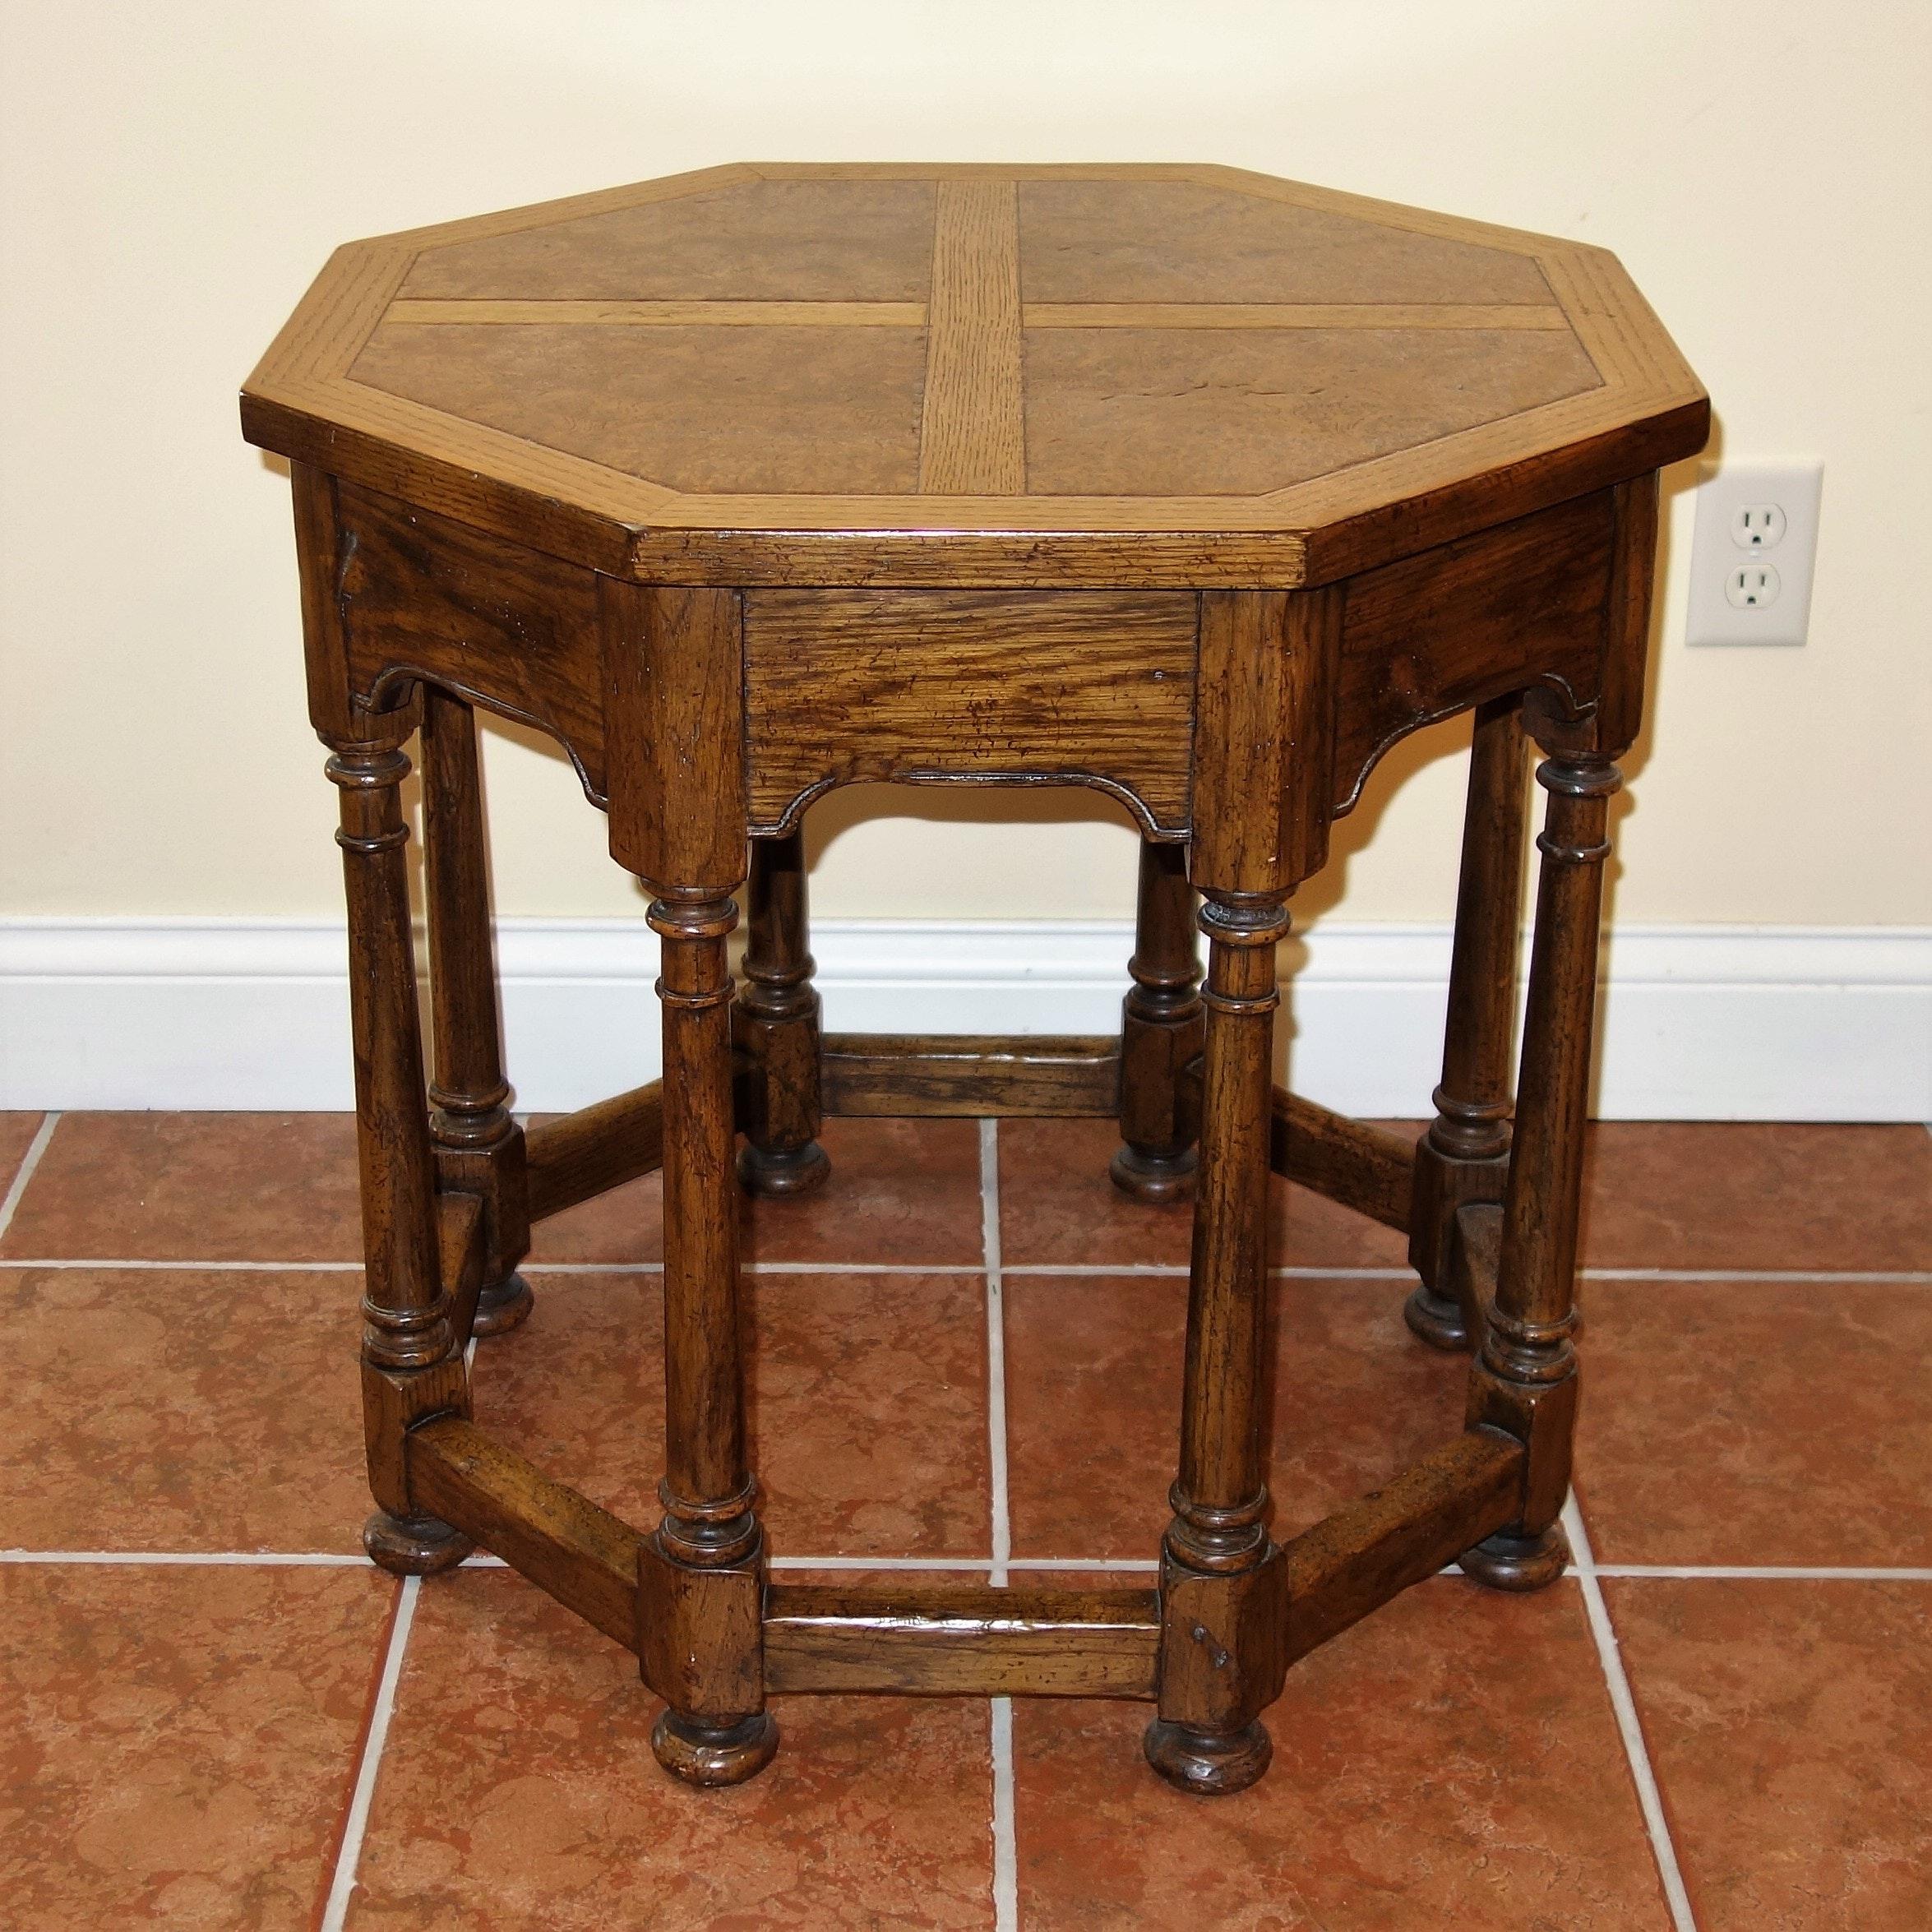 Burl Octogon Side Table by Baker Furniture